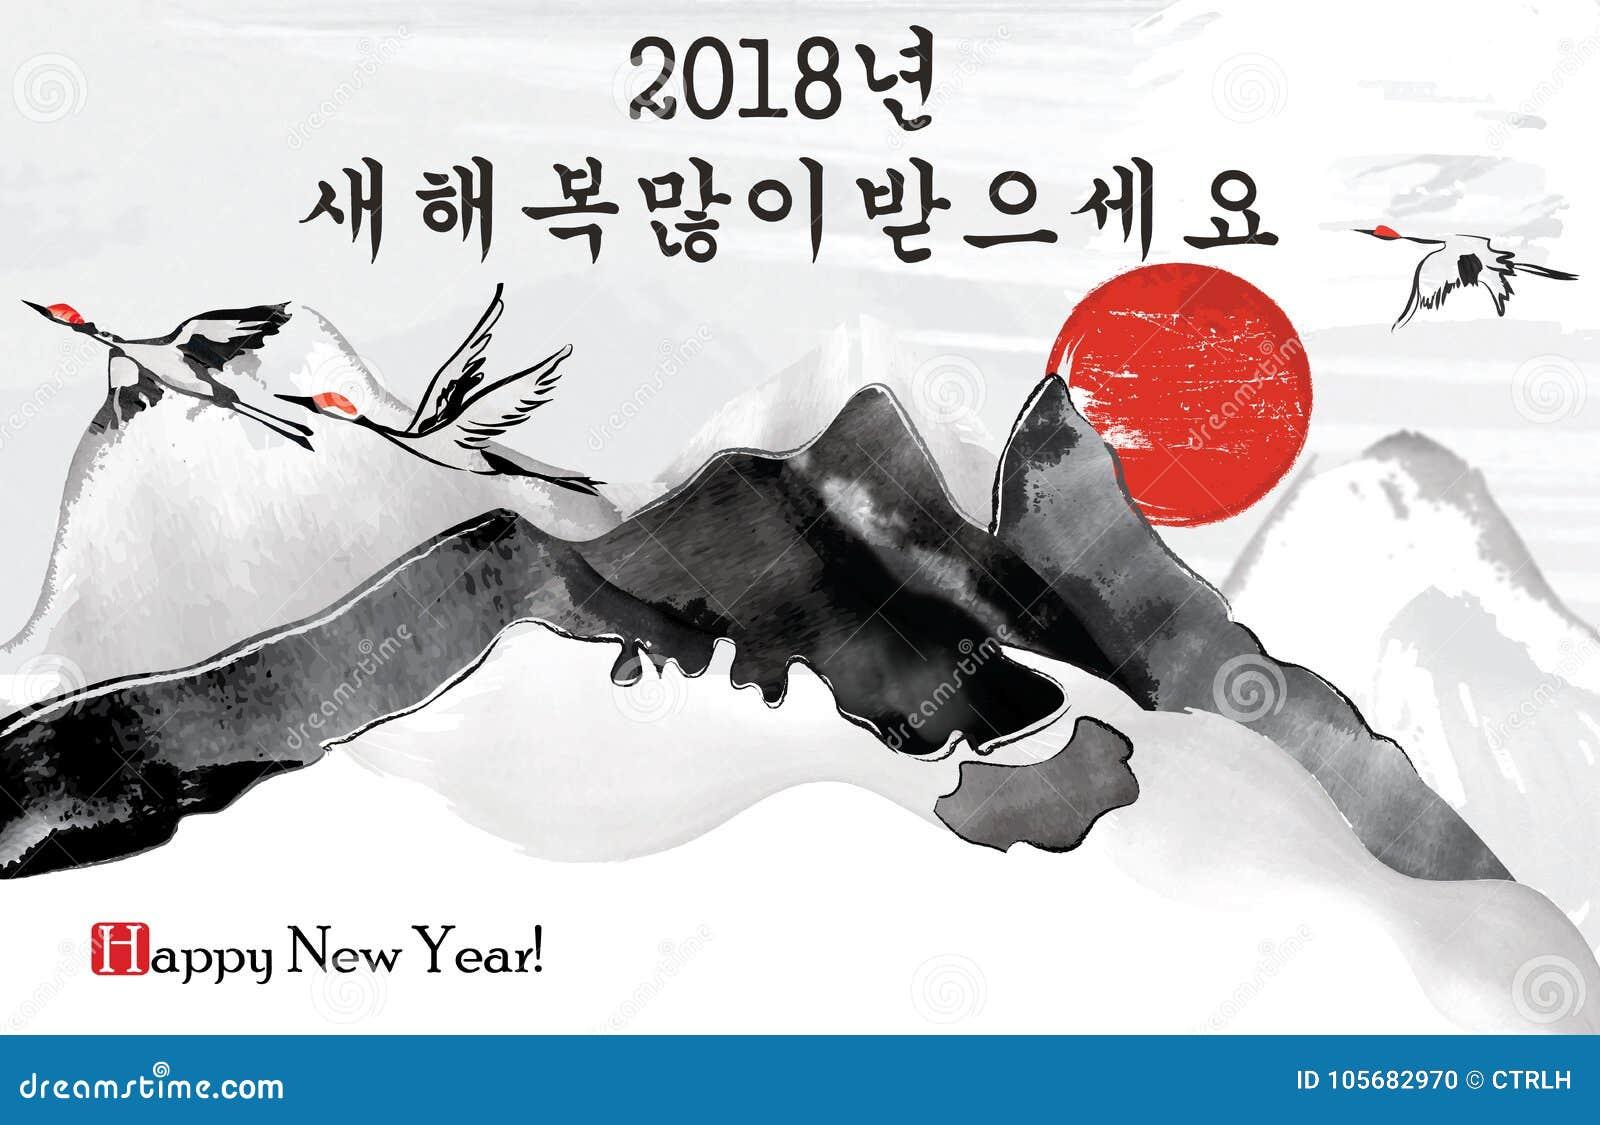 Happy korean new year 2018 greeting card stock illustration happy korean new year 2018 greeting card m4hsunfo